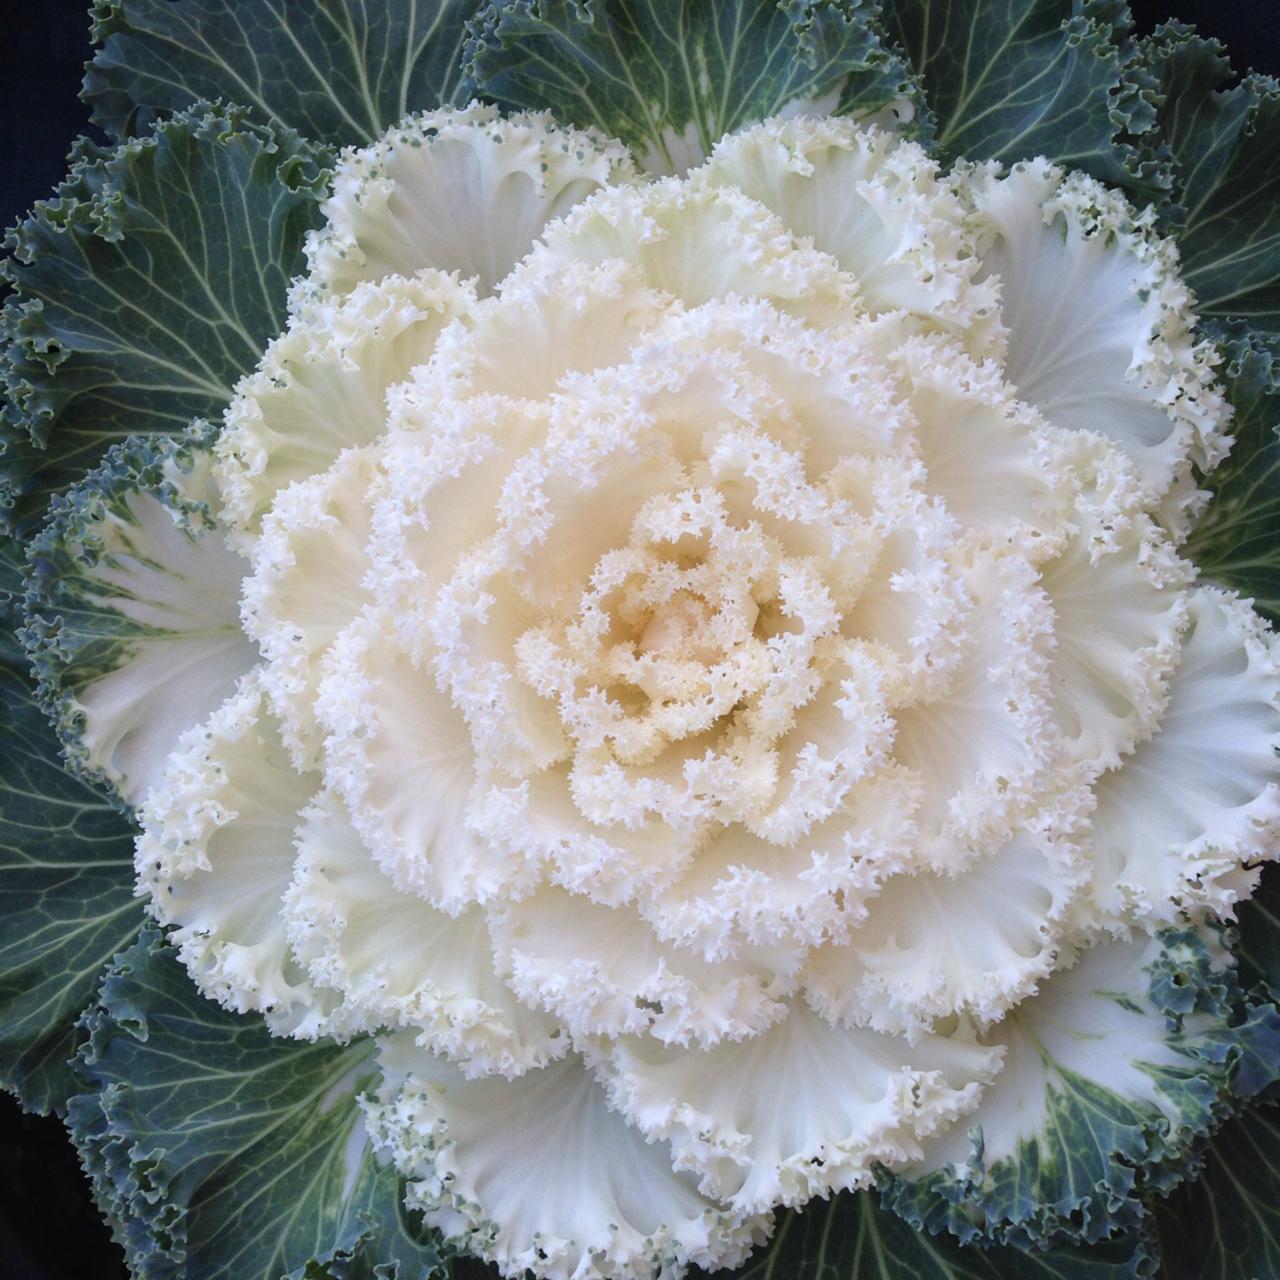 kale growit